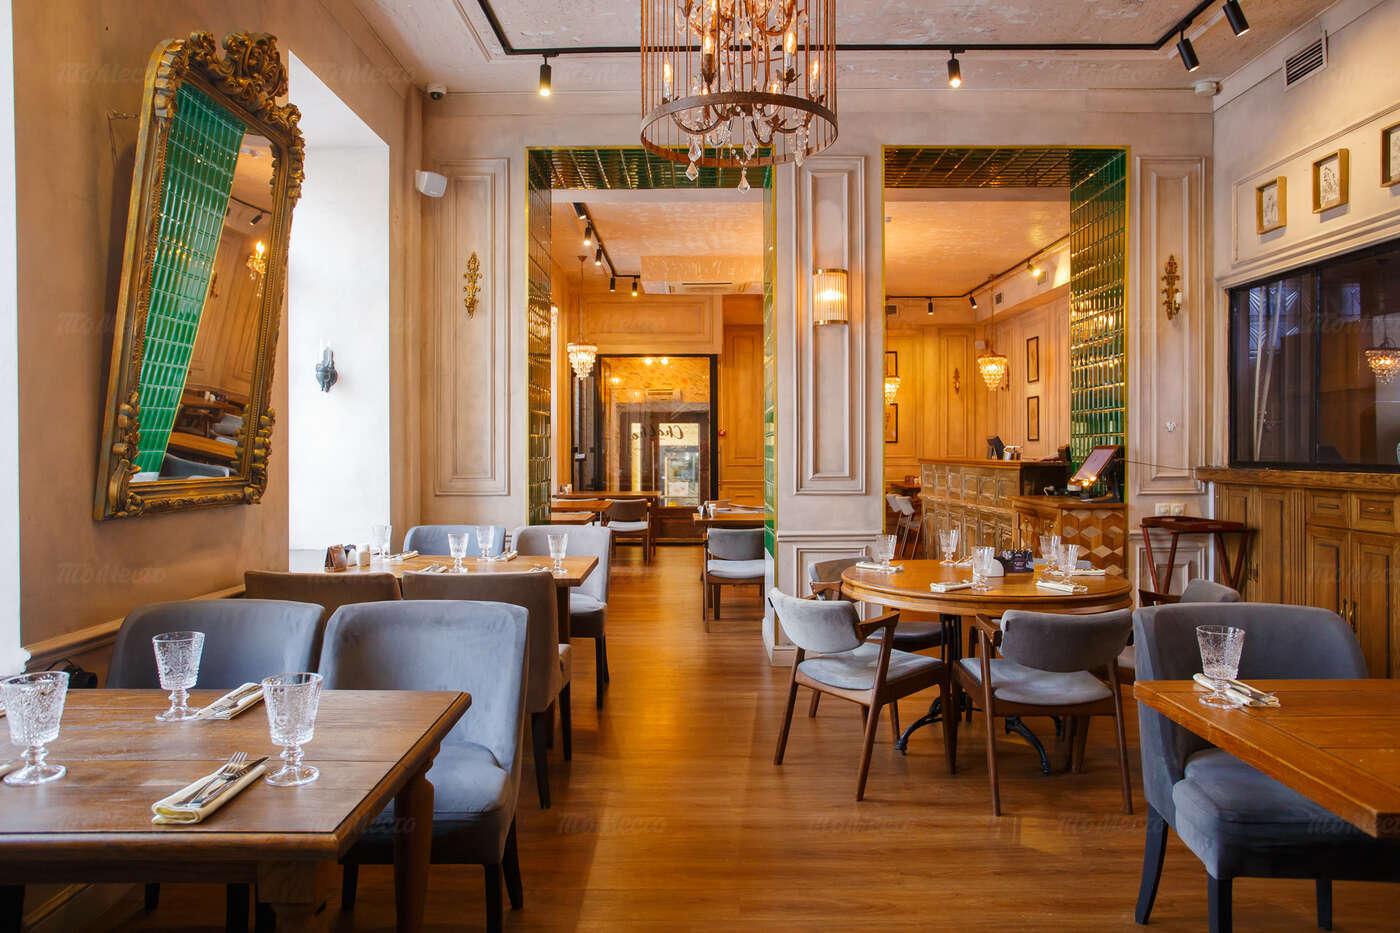 Ресторан Чача на набережной канала Грибоедова фото 13